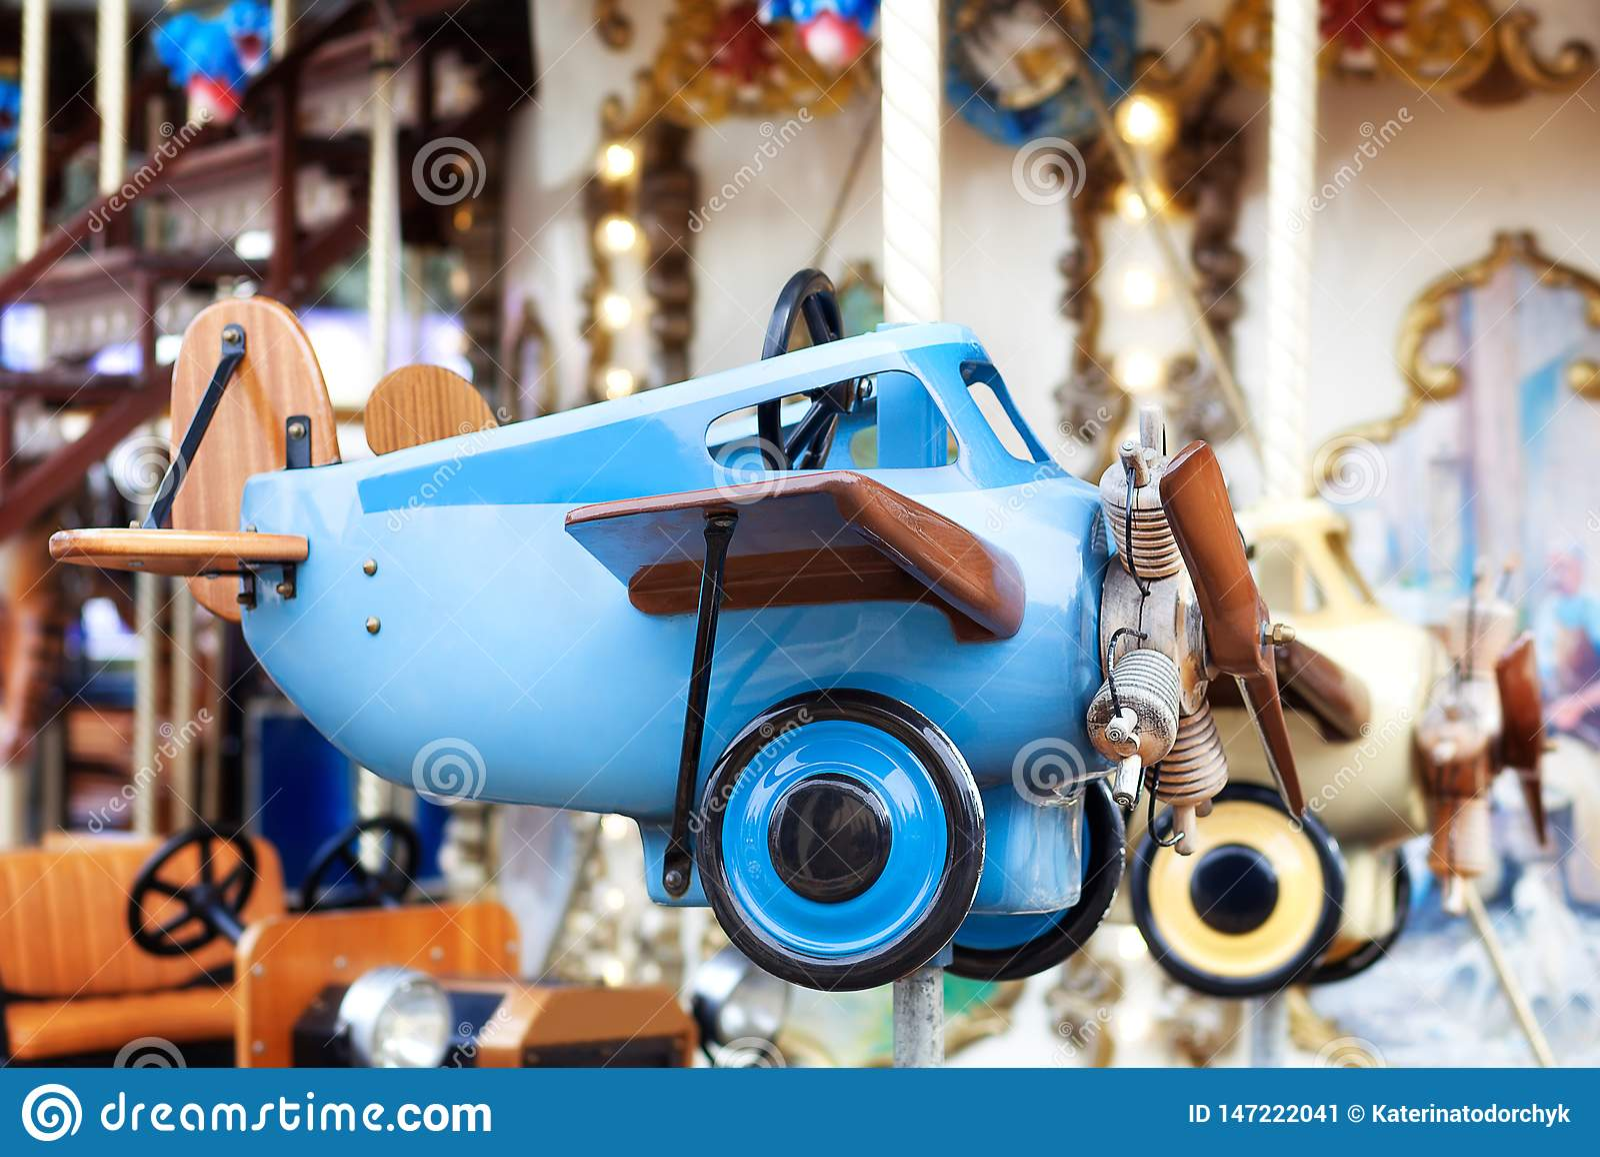 Children`s vintage blue plane. Children`s carousel. Kids toys. Little pilot. Retro plane.old plane, biplane. Aviation Day.